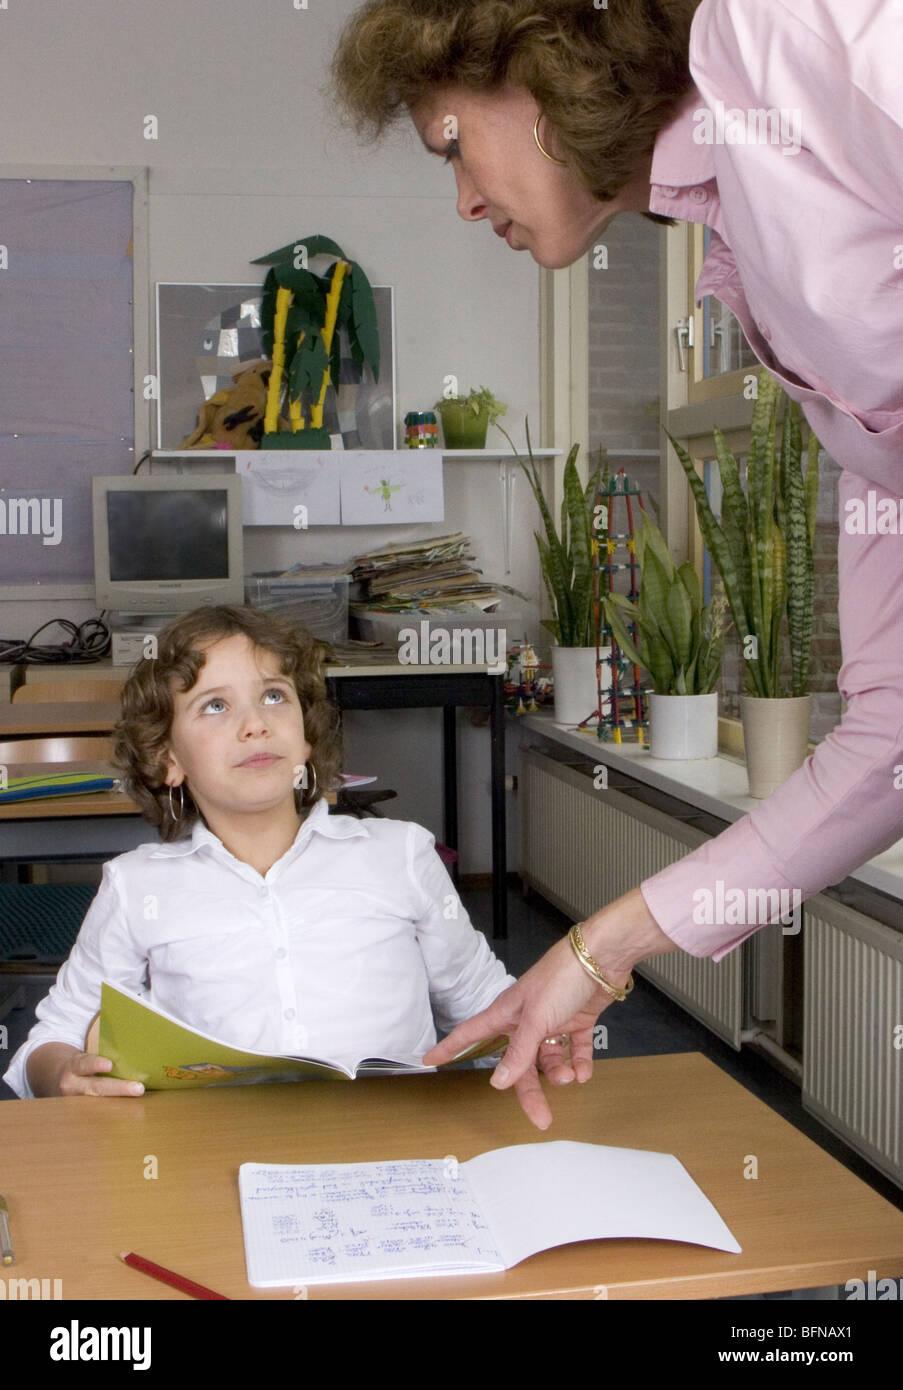 Regeln für Lehrer datieren Schüler uk